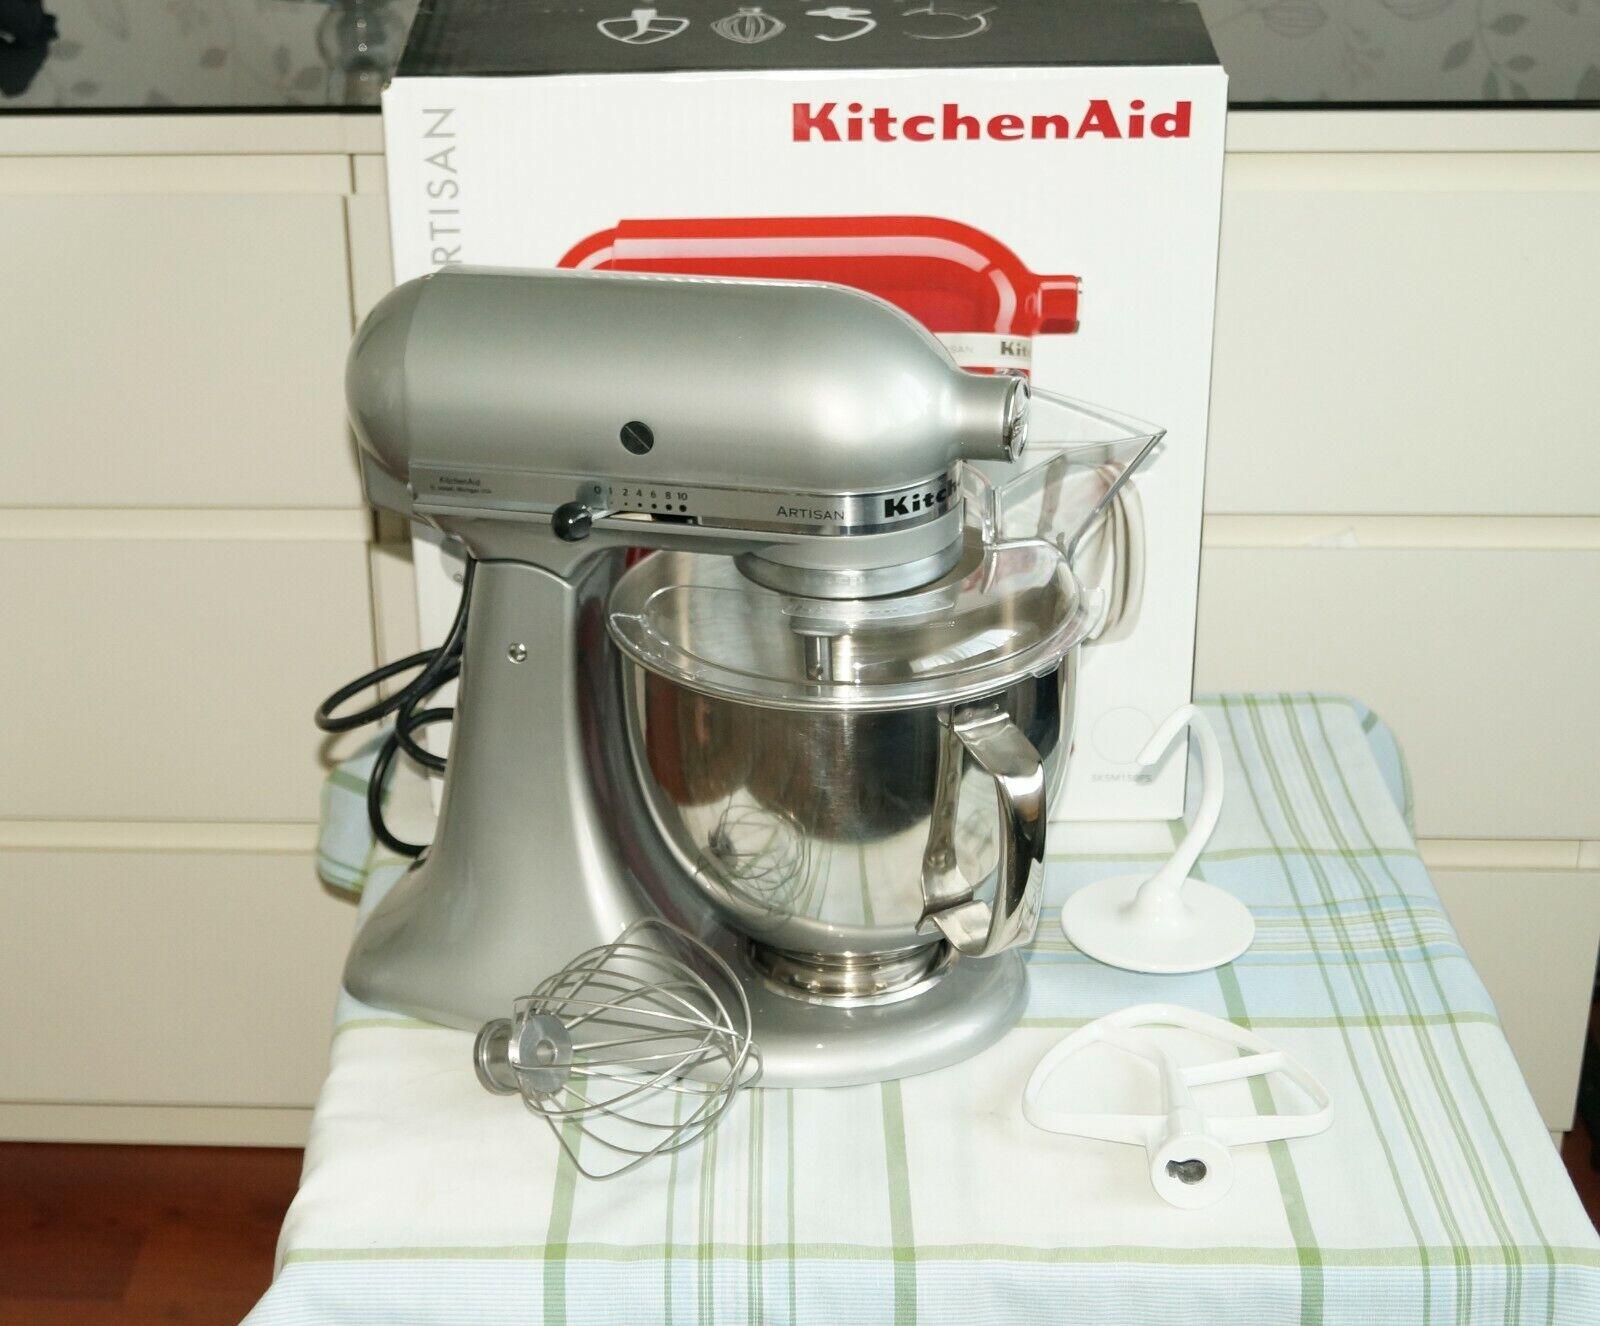 KitchenAid 5KSM150PSEMC Artisan Küchenmaschine Grau (4,8 Liter, 300 Watt)